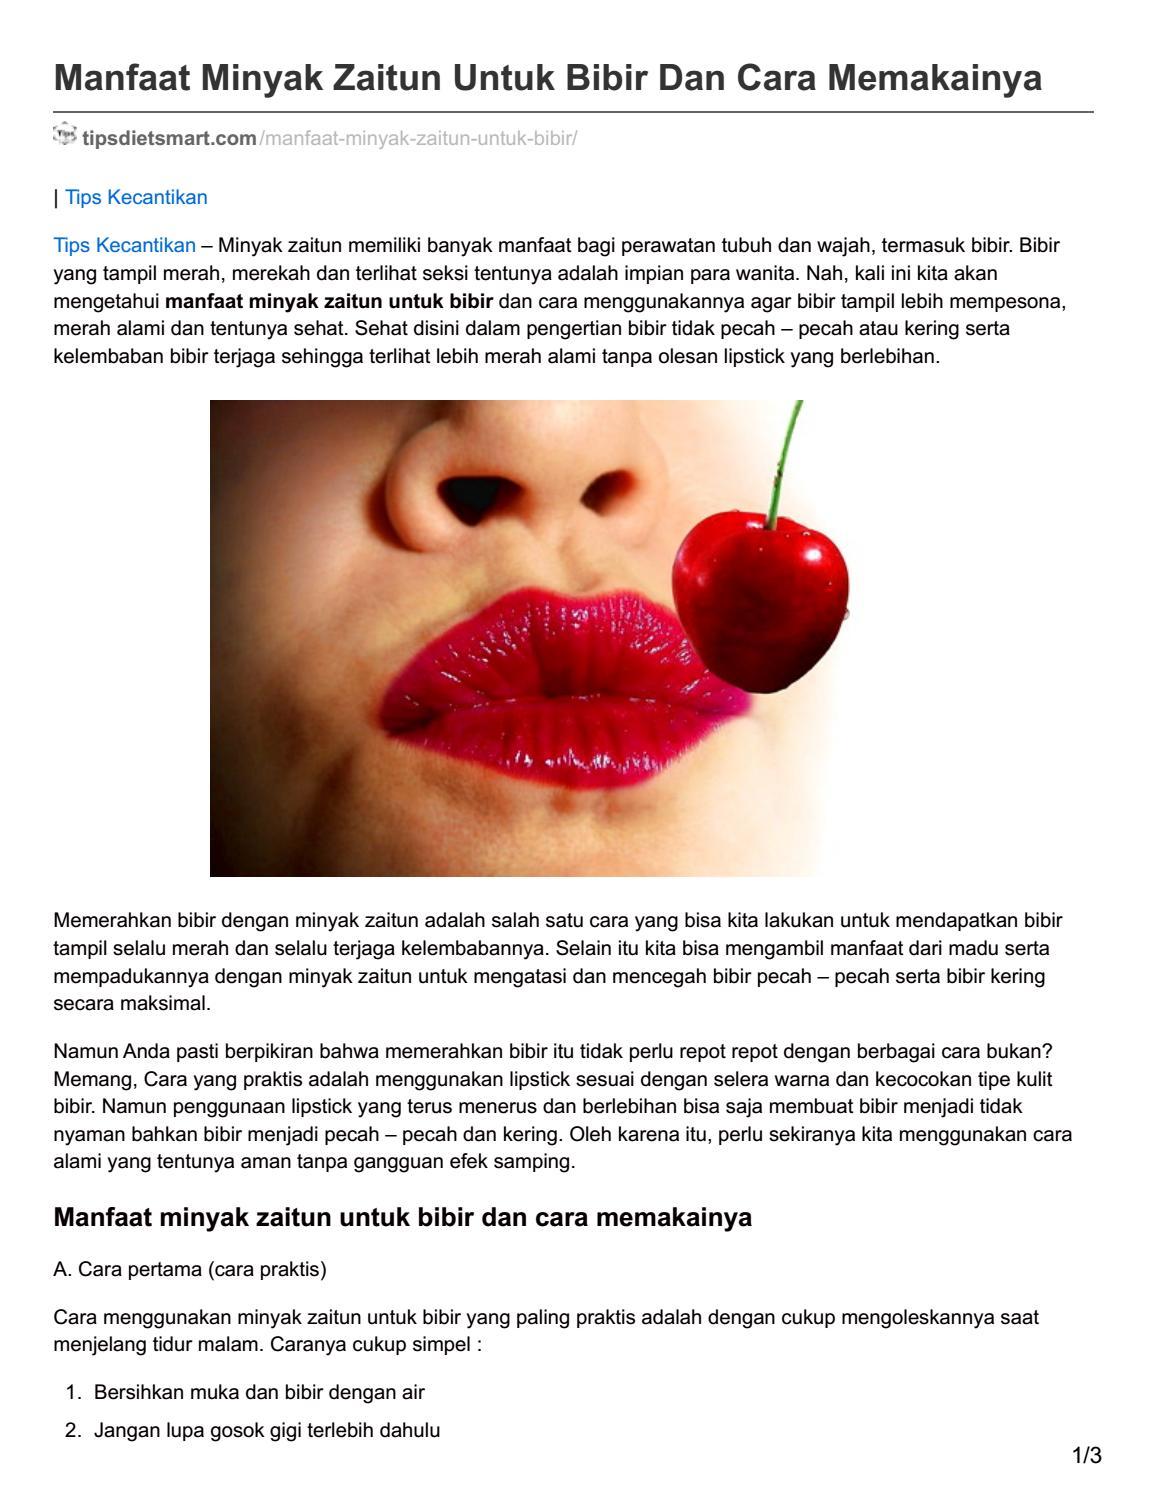 Tipsdietsmart Com Manfaat Minyak Zaitun Untuk Bibir Dan Cara Memakainya By Rudmustain Issuu